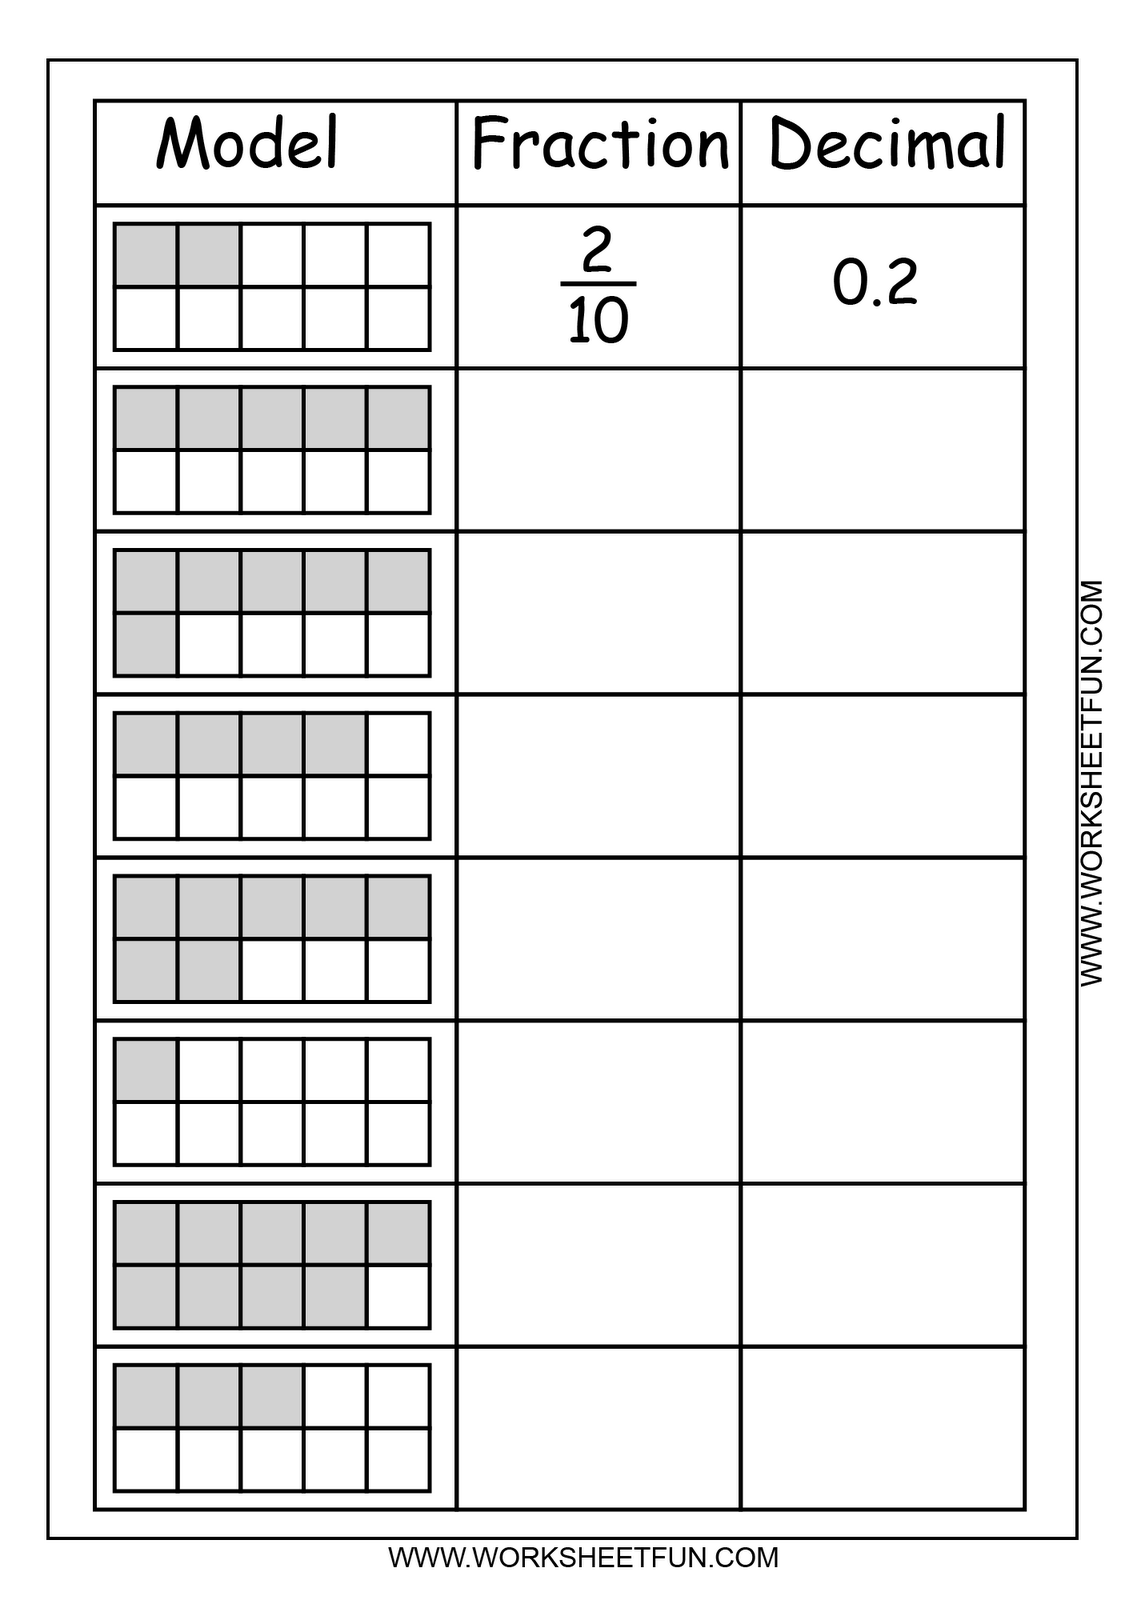 Free Printable Worksheets: Fraction - Decimal | Fractions ...